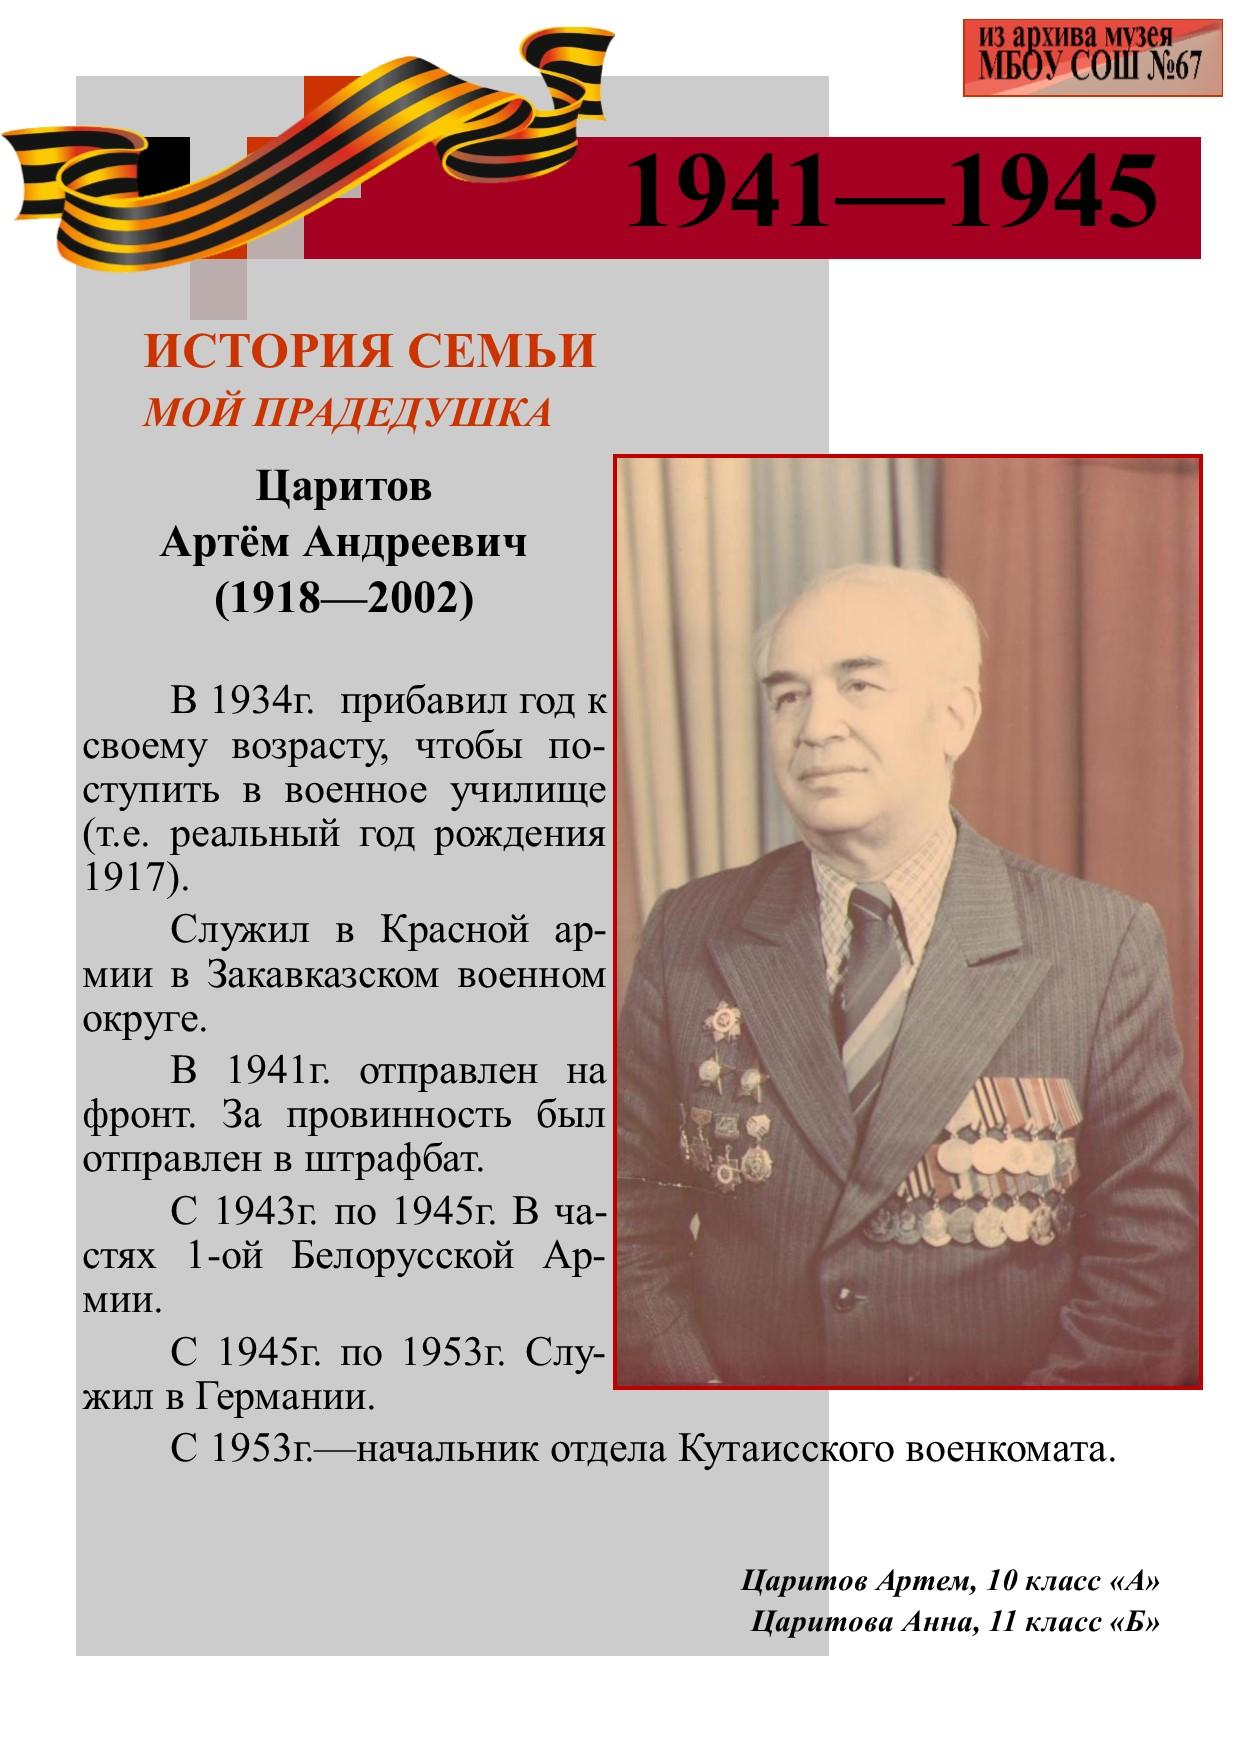 Царитов А.А.